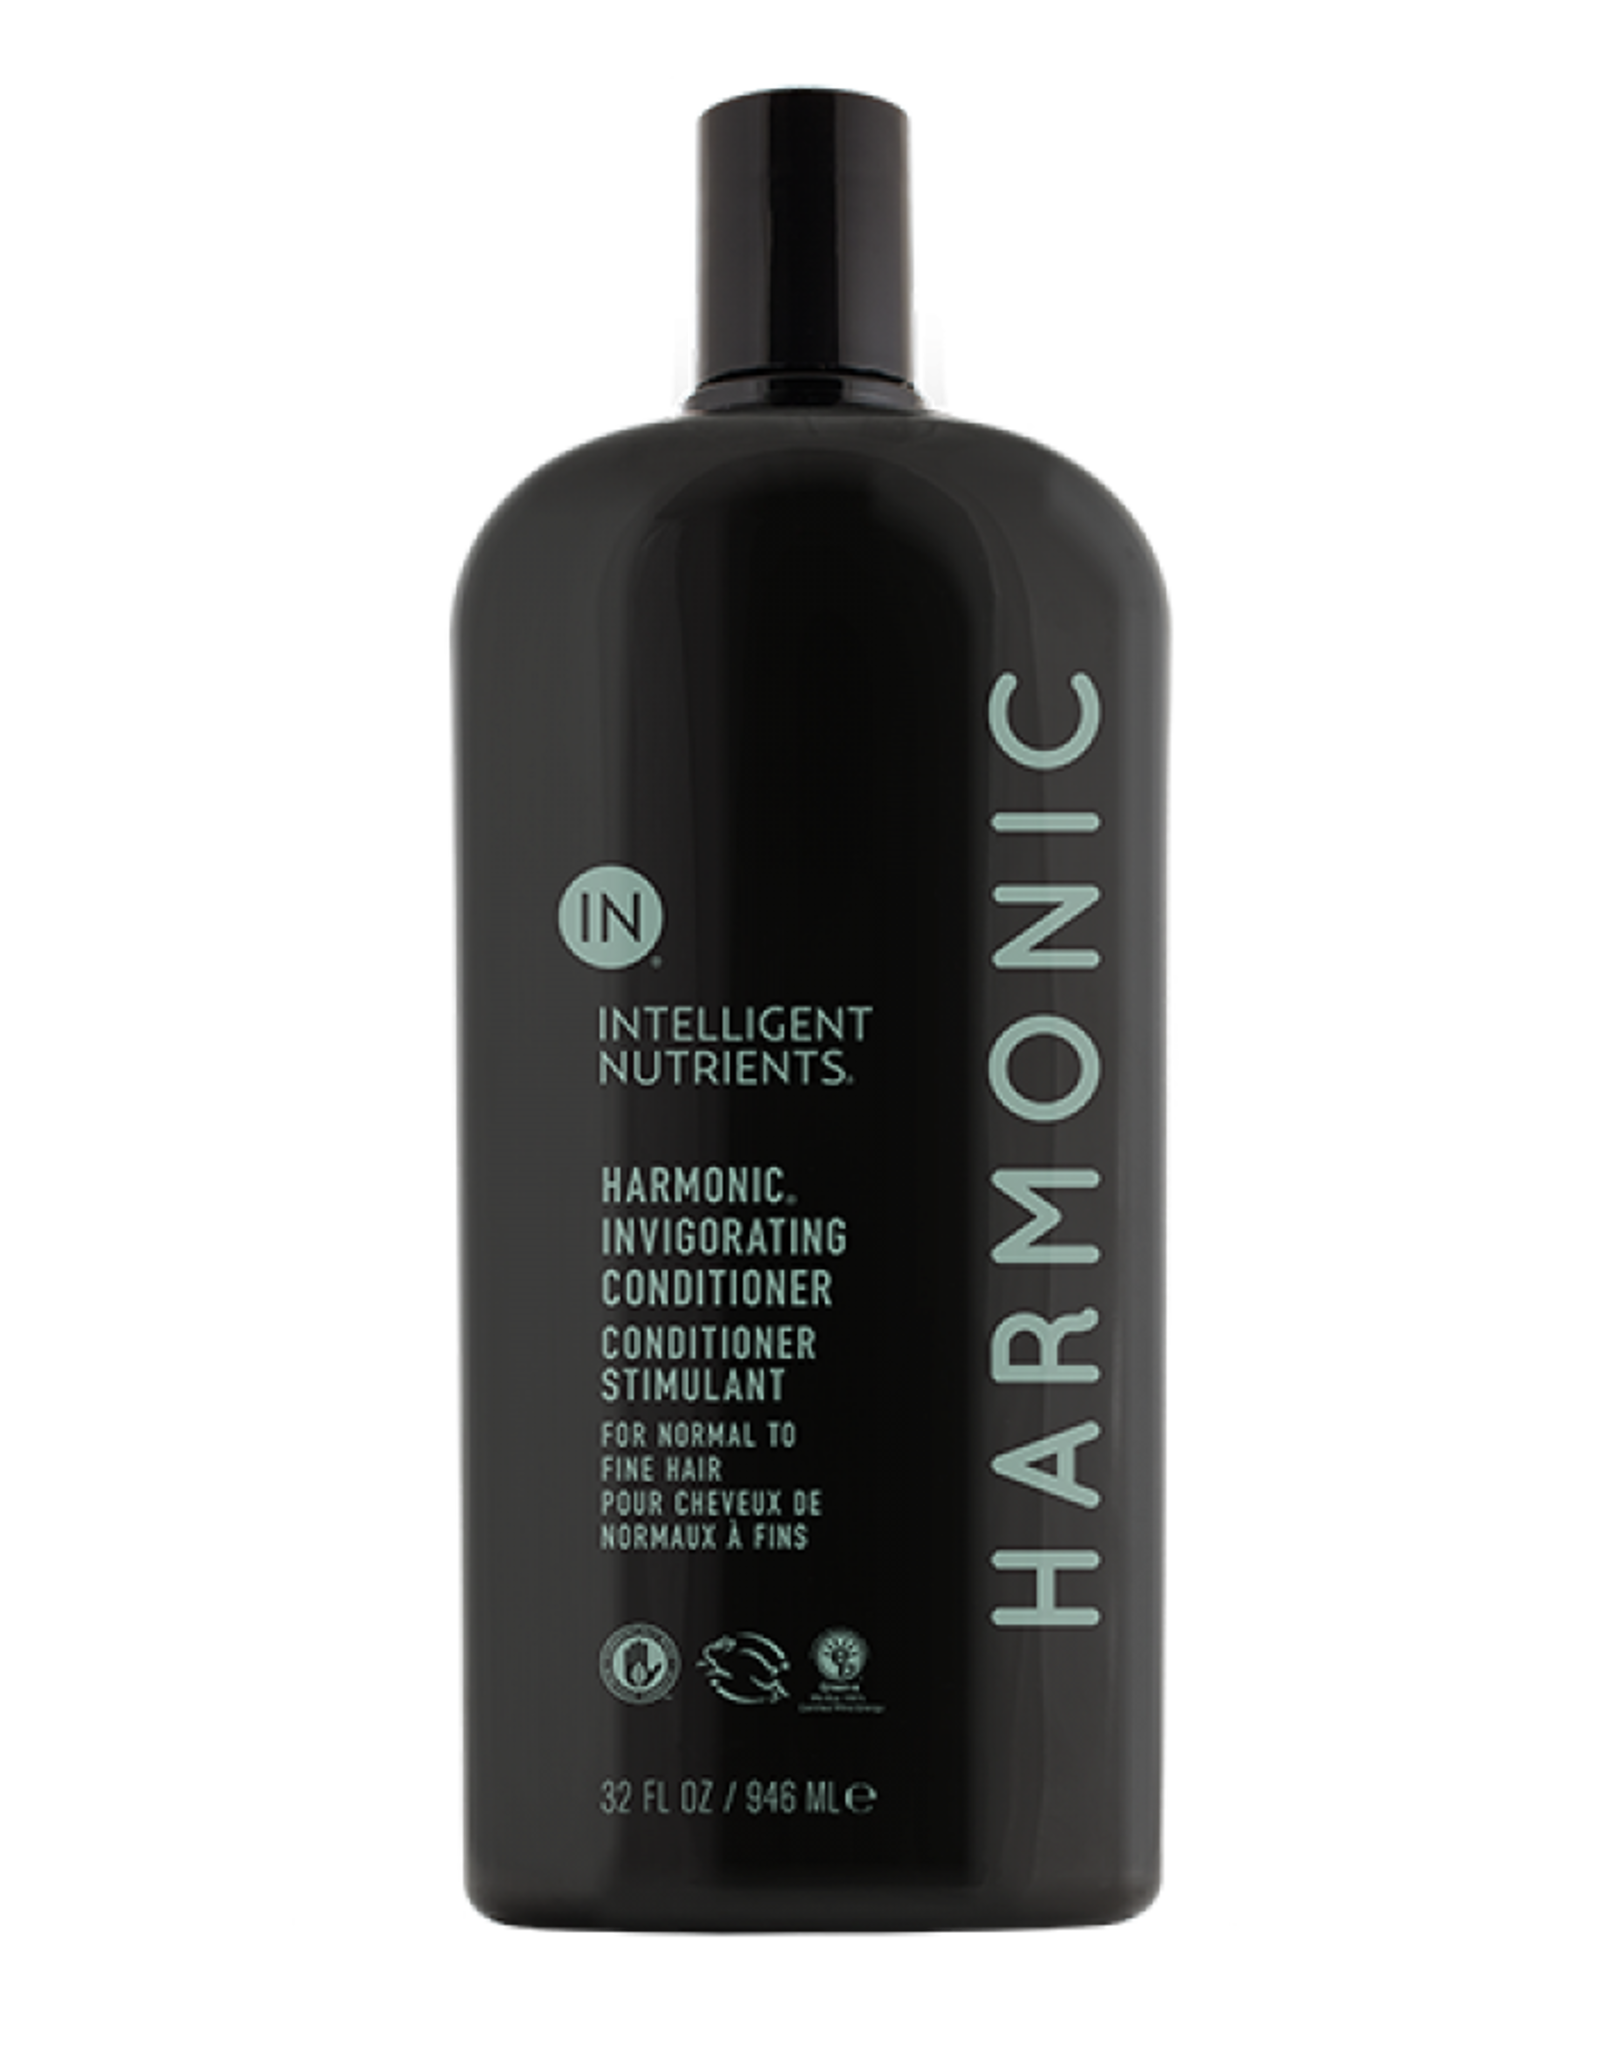 Intelligent Nutrients Harmonic Invigorating Conditioner